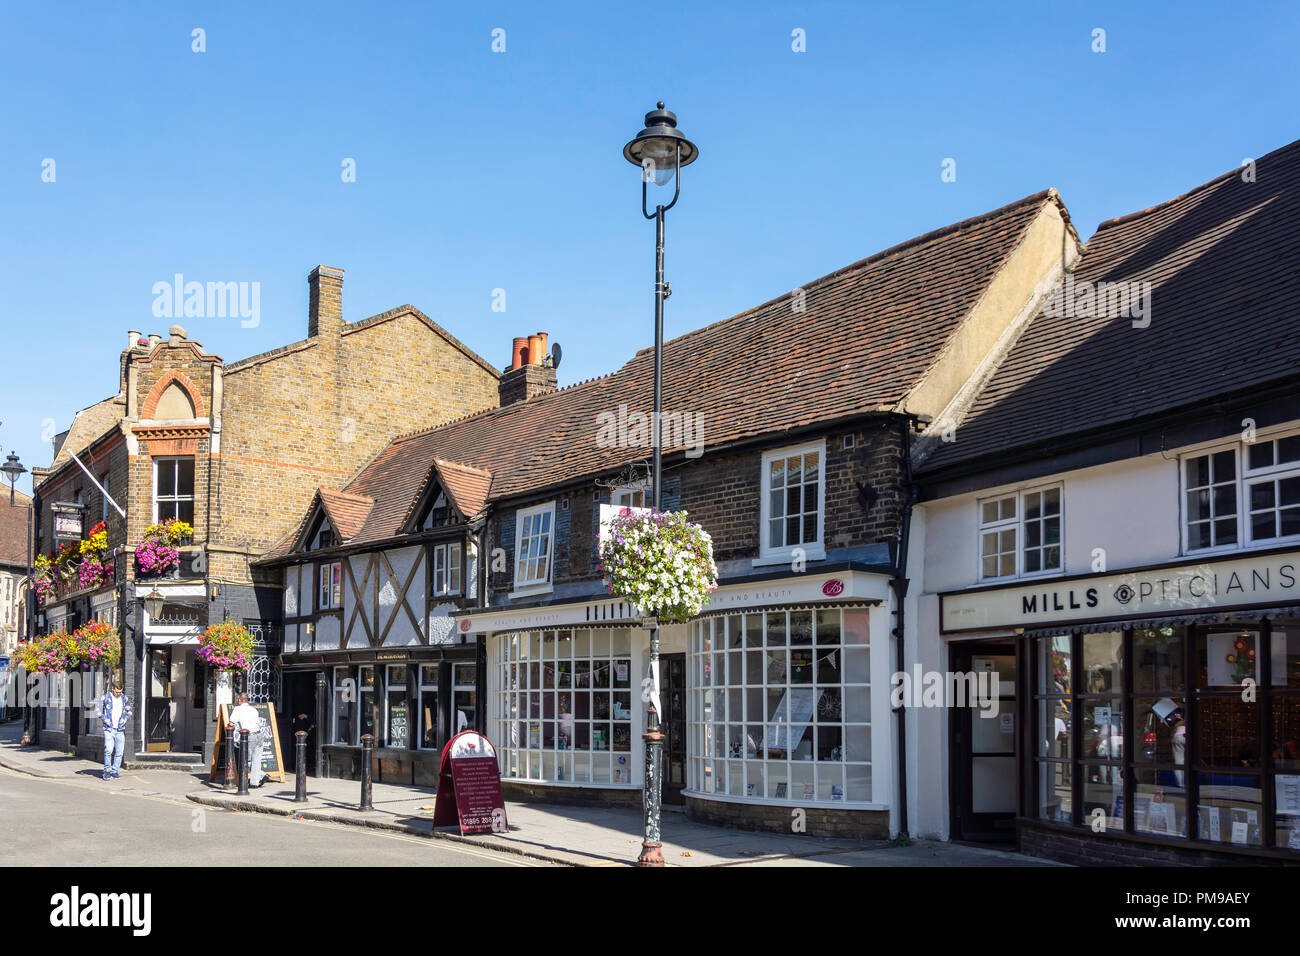 Period buildings, Windsor Street, Uxbridge, London Borough of Hillington, Greater London, England, United Kingdom - Stock Image